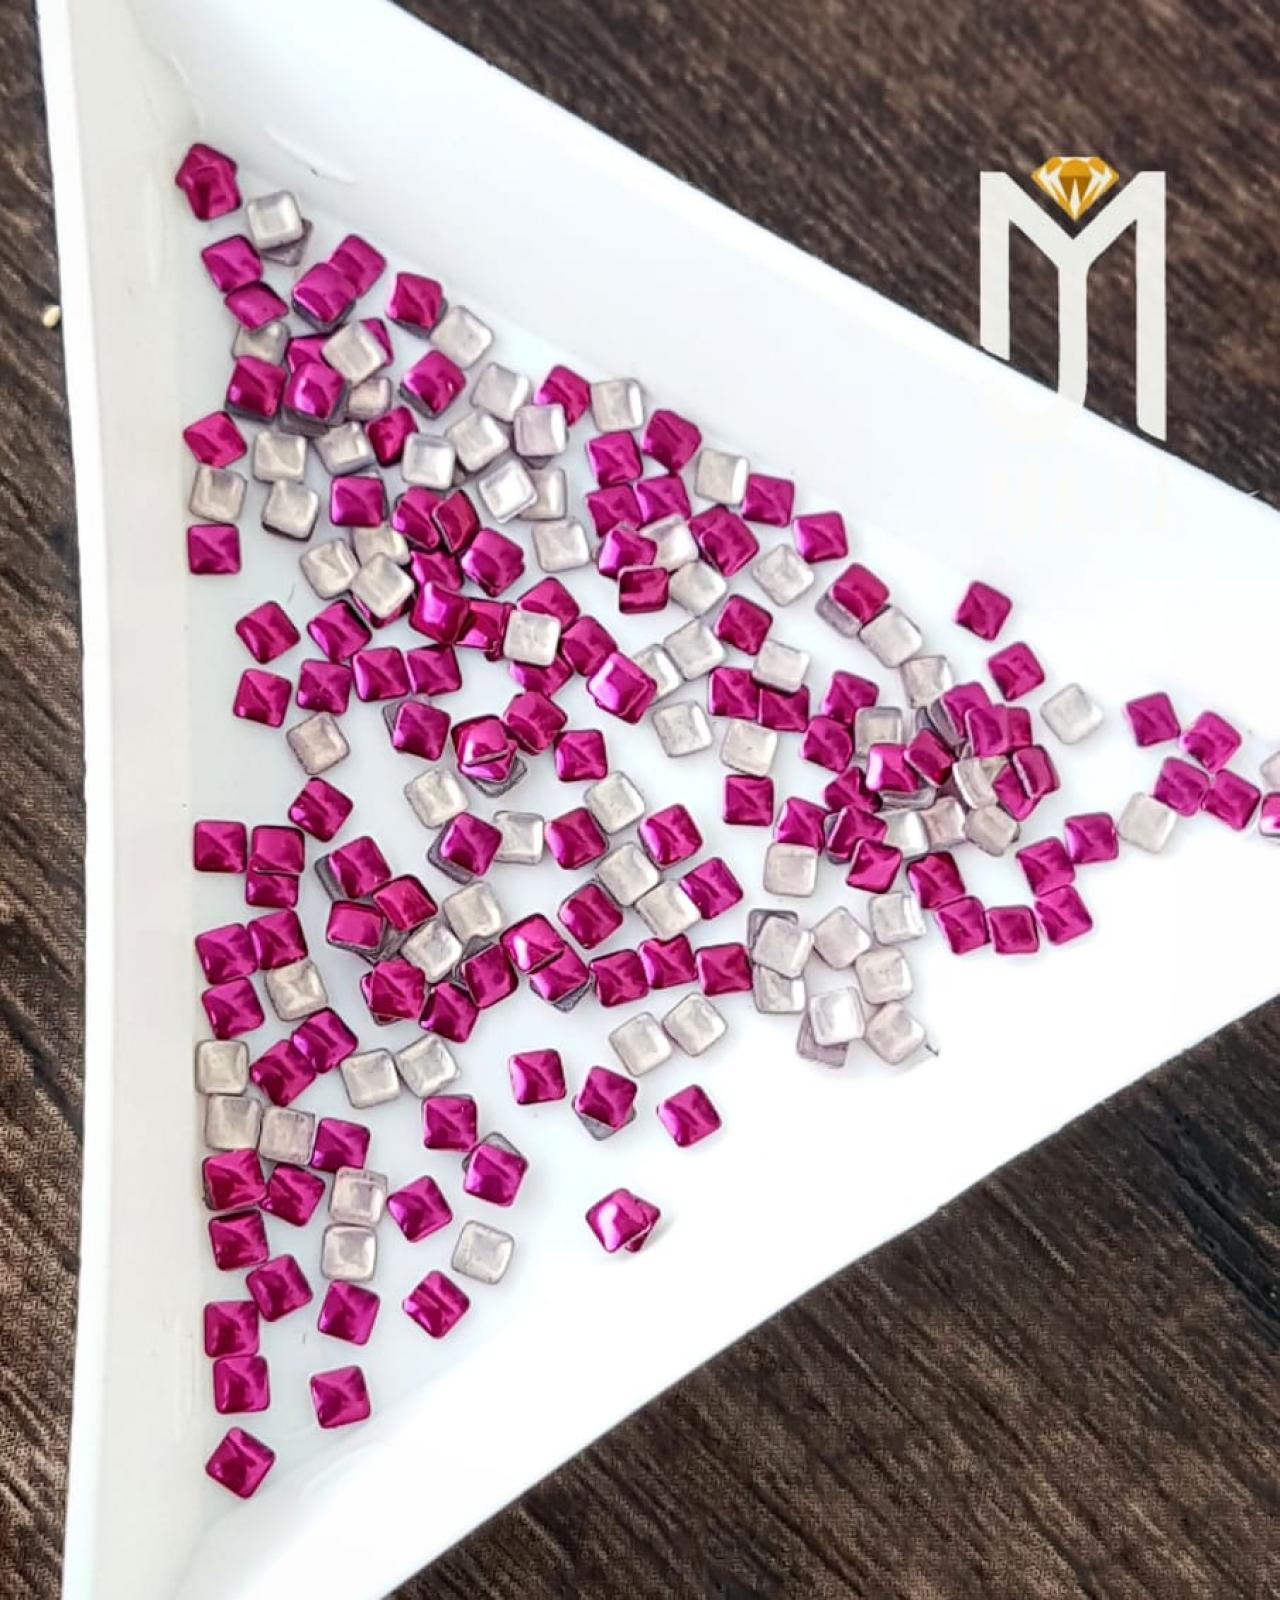 CHAPINHA METAL QUADRADA 2X2 ROSA PINK 1